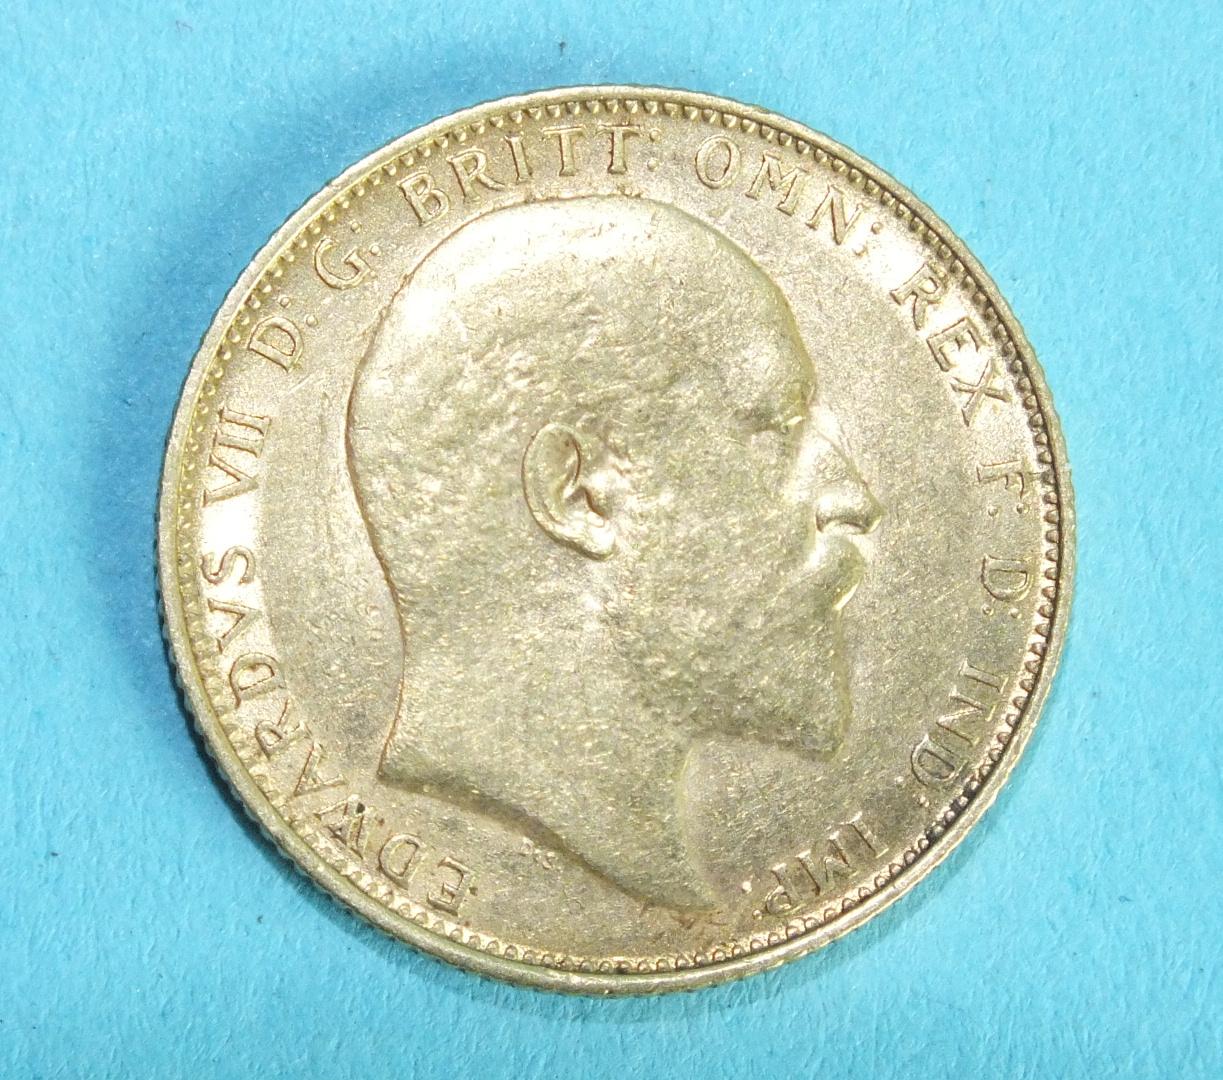 Lot 355 - An Edward VII 1910 sovereign, Melbourne Mint.